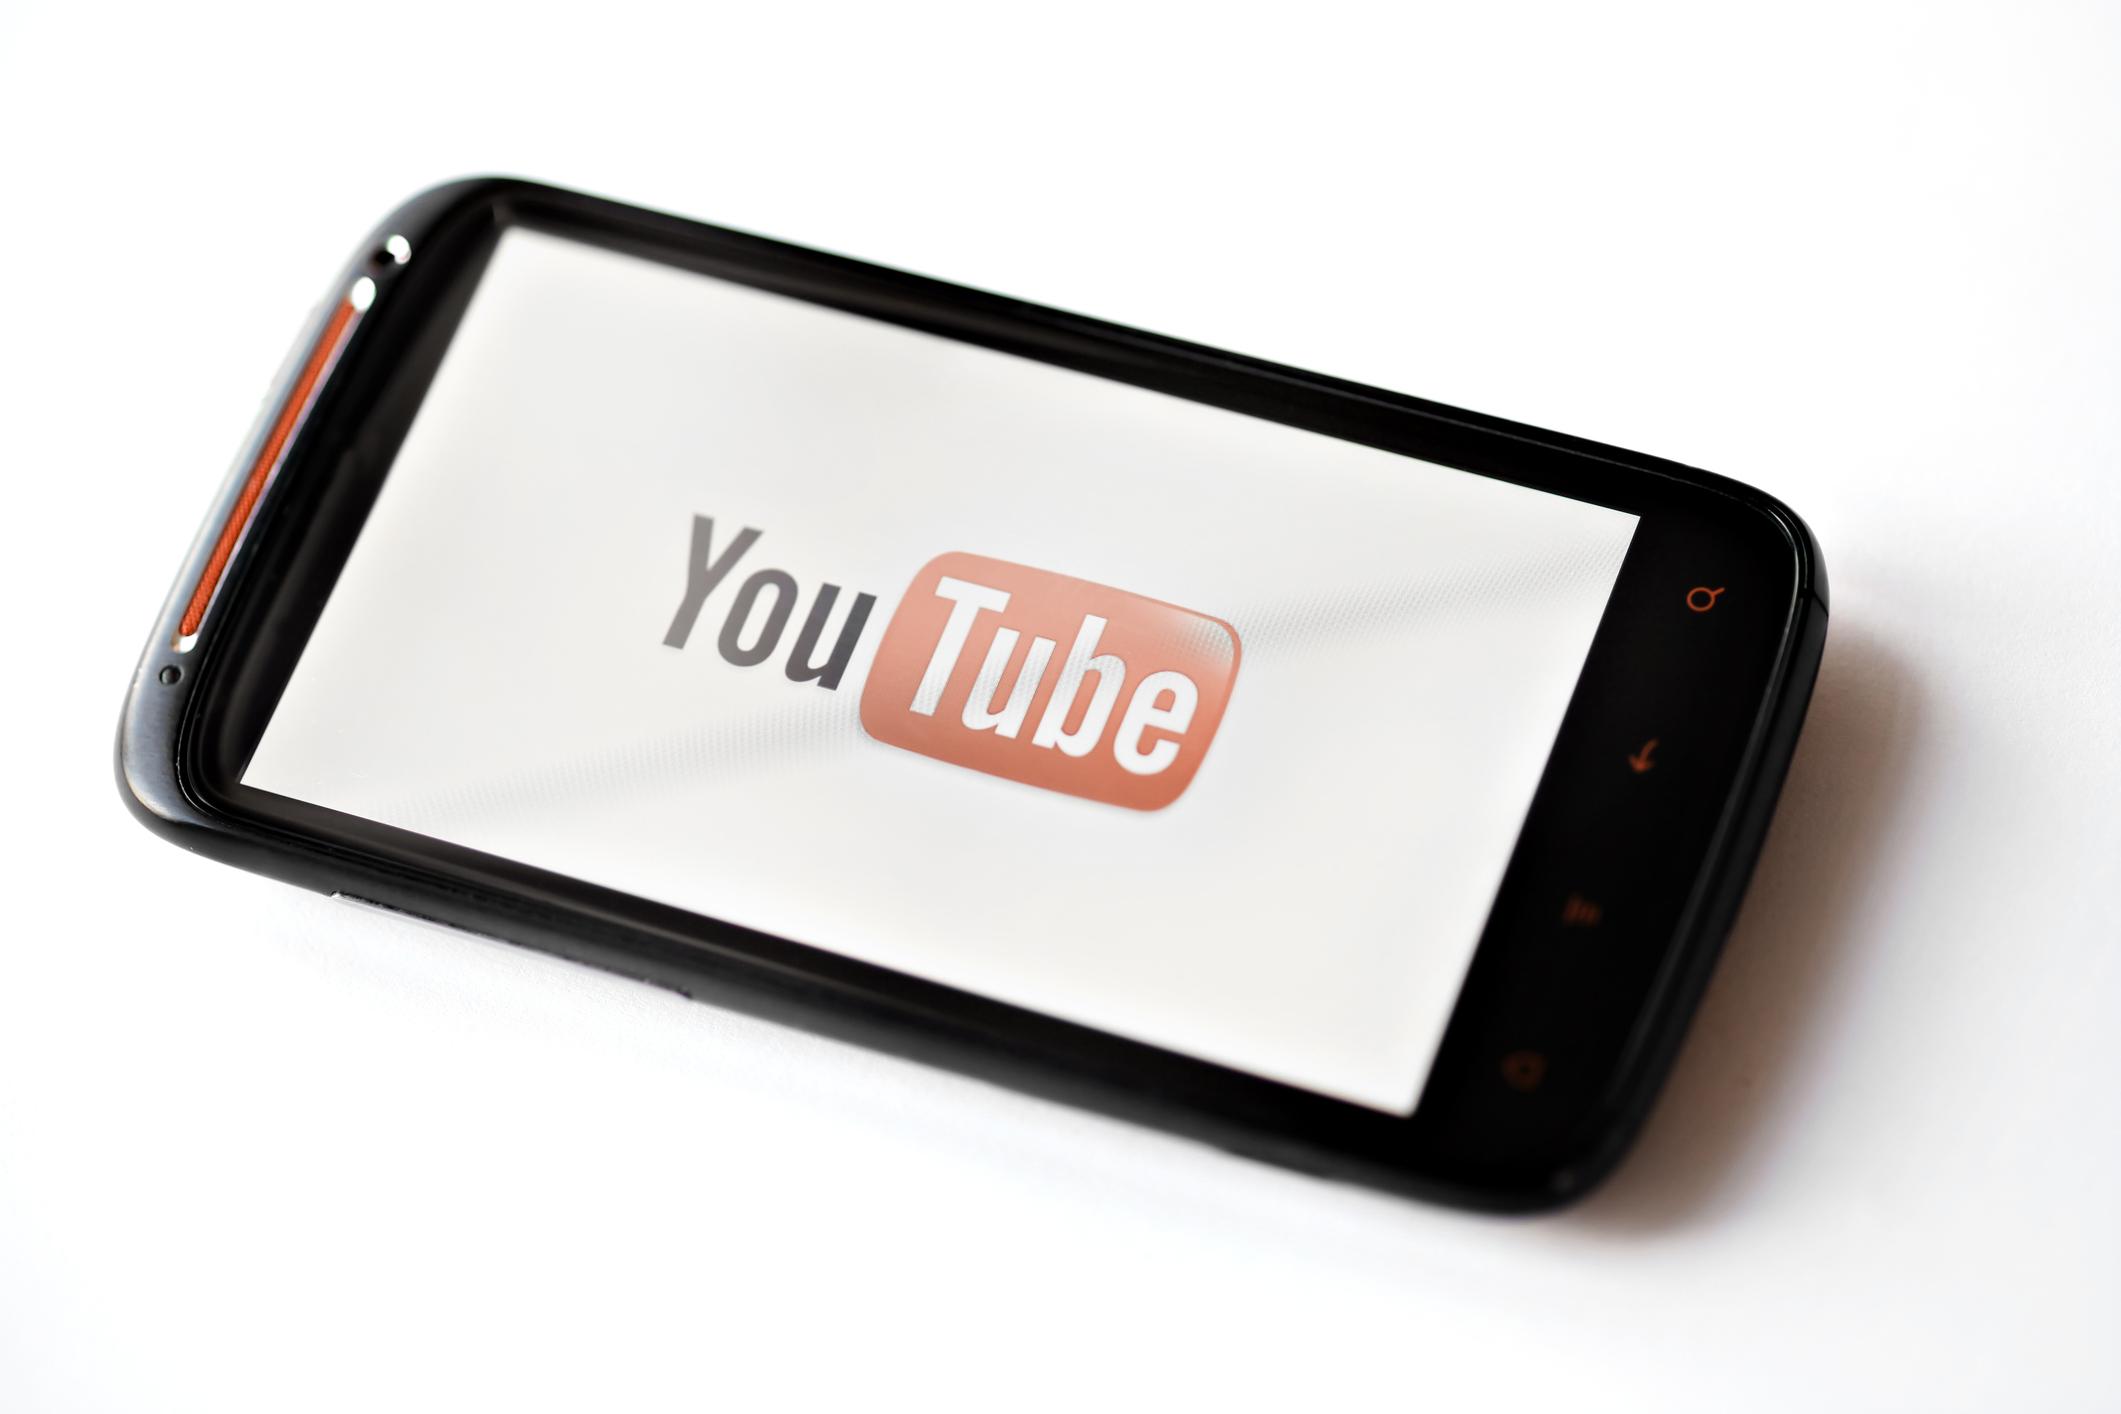 Youtube phone